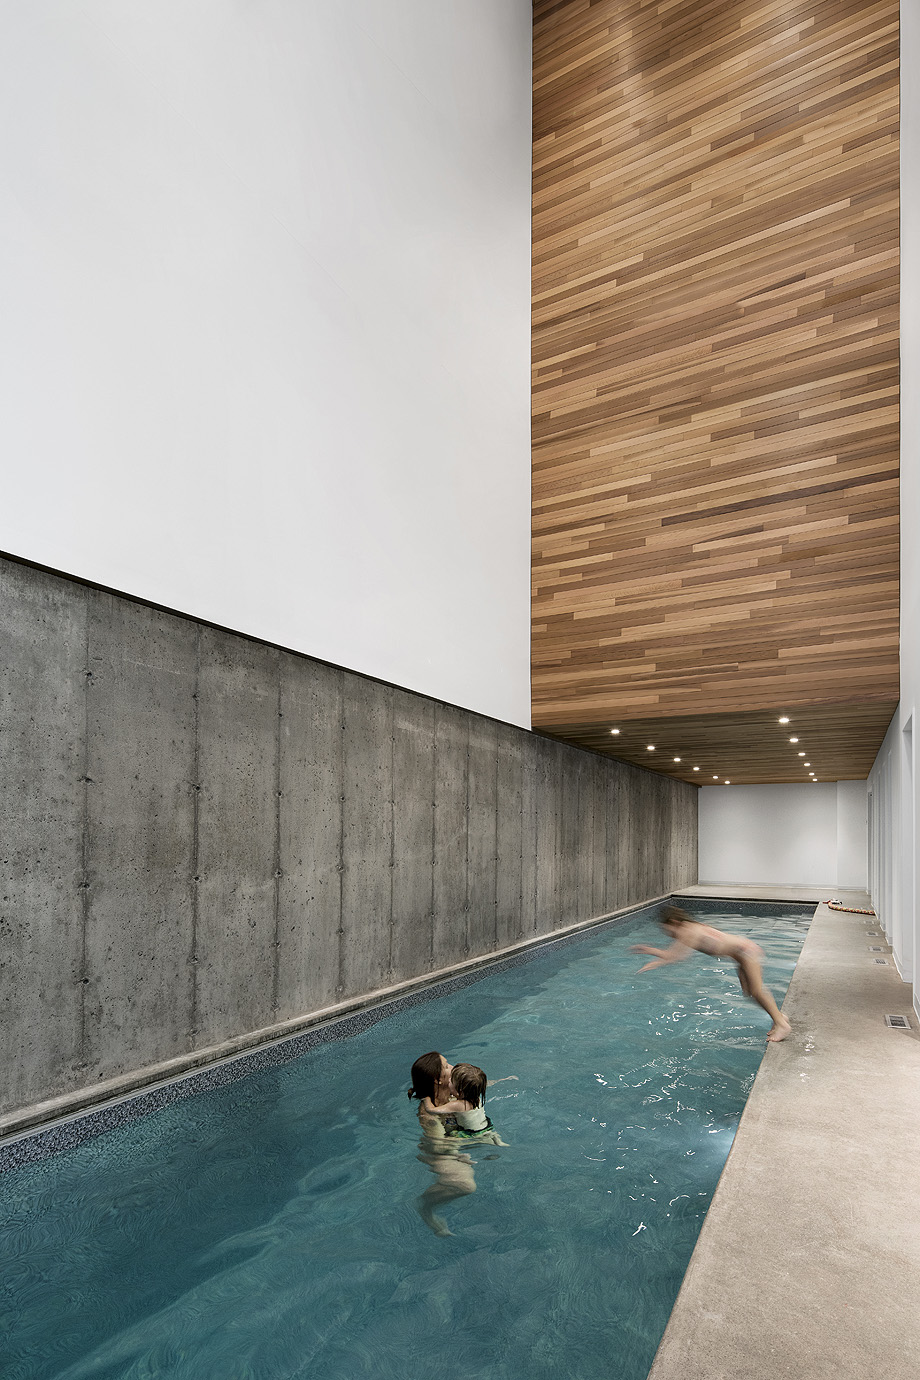 casa accostee de bourgeois lechasseur architects - foto adrien williams (10)